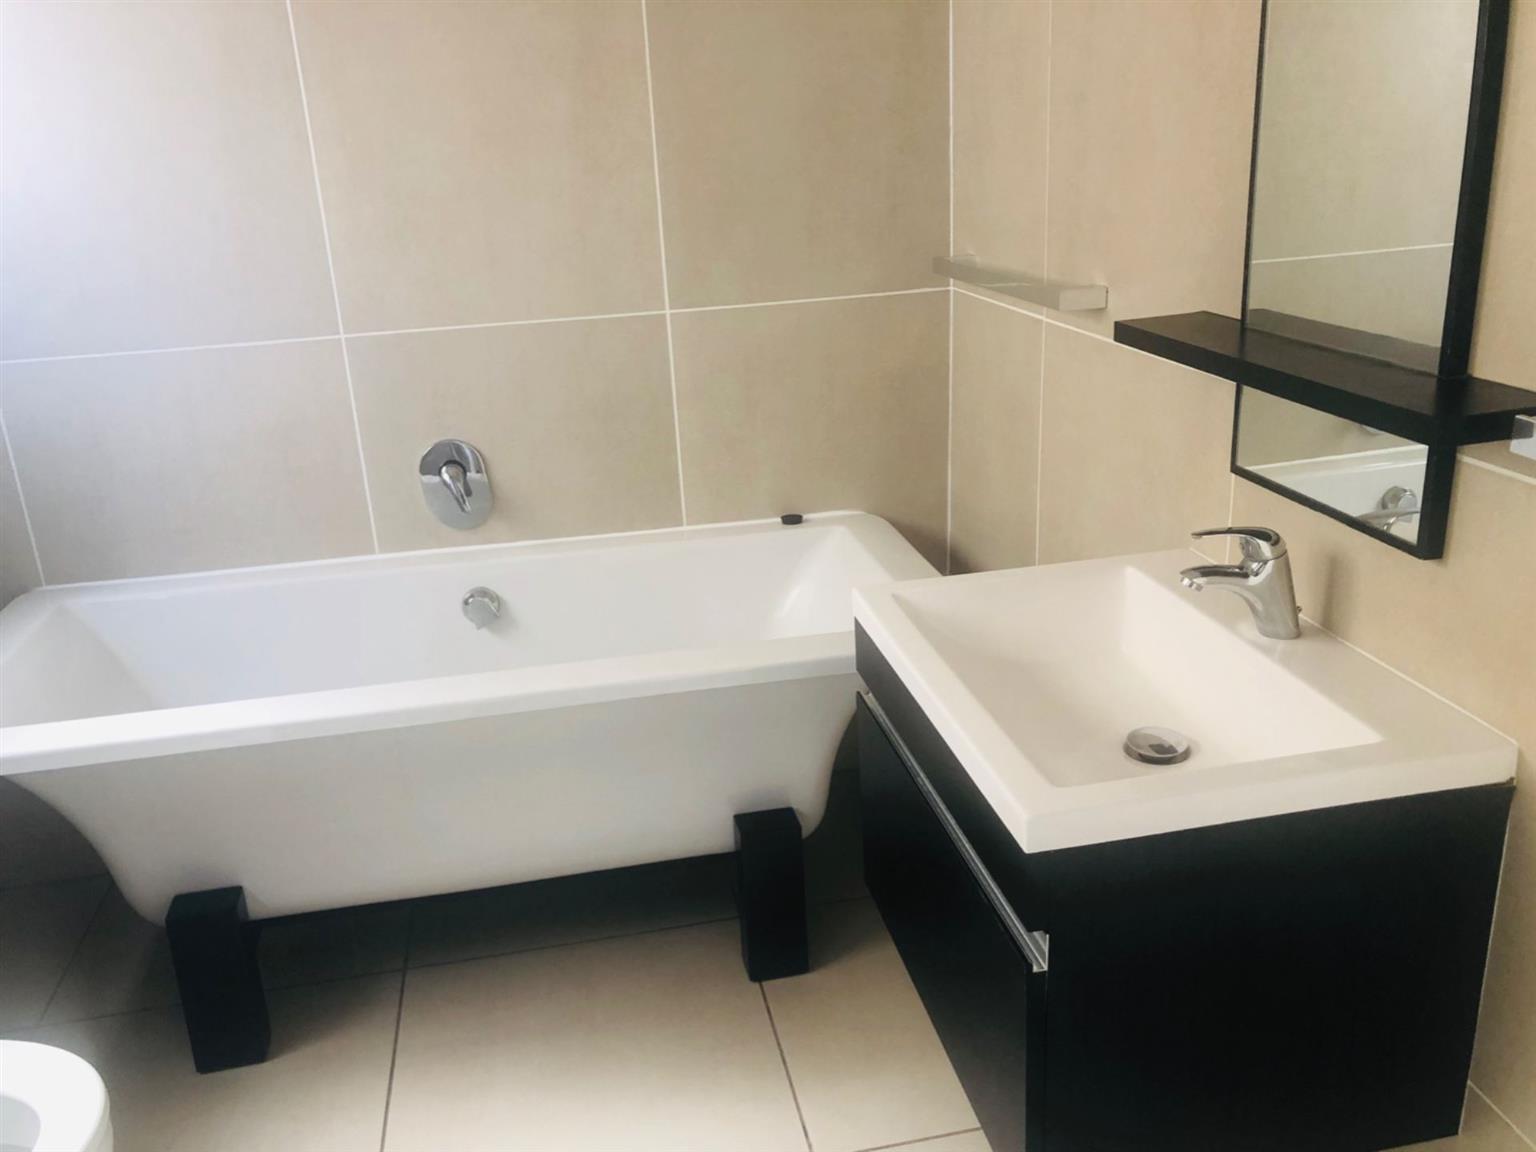 Apartment Rental Monthly in KYALAMI HILLS